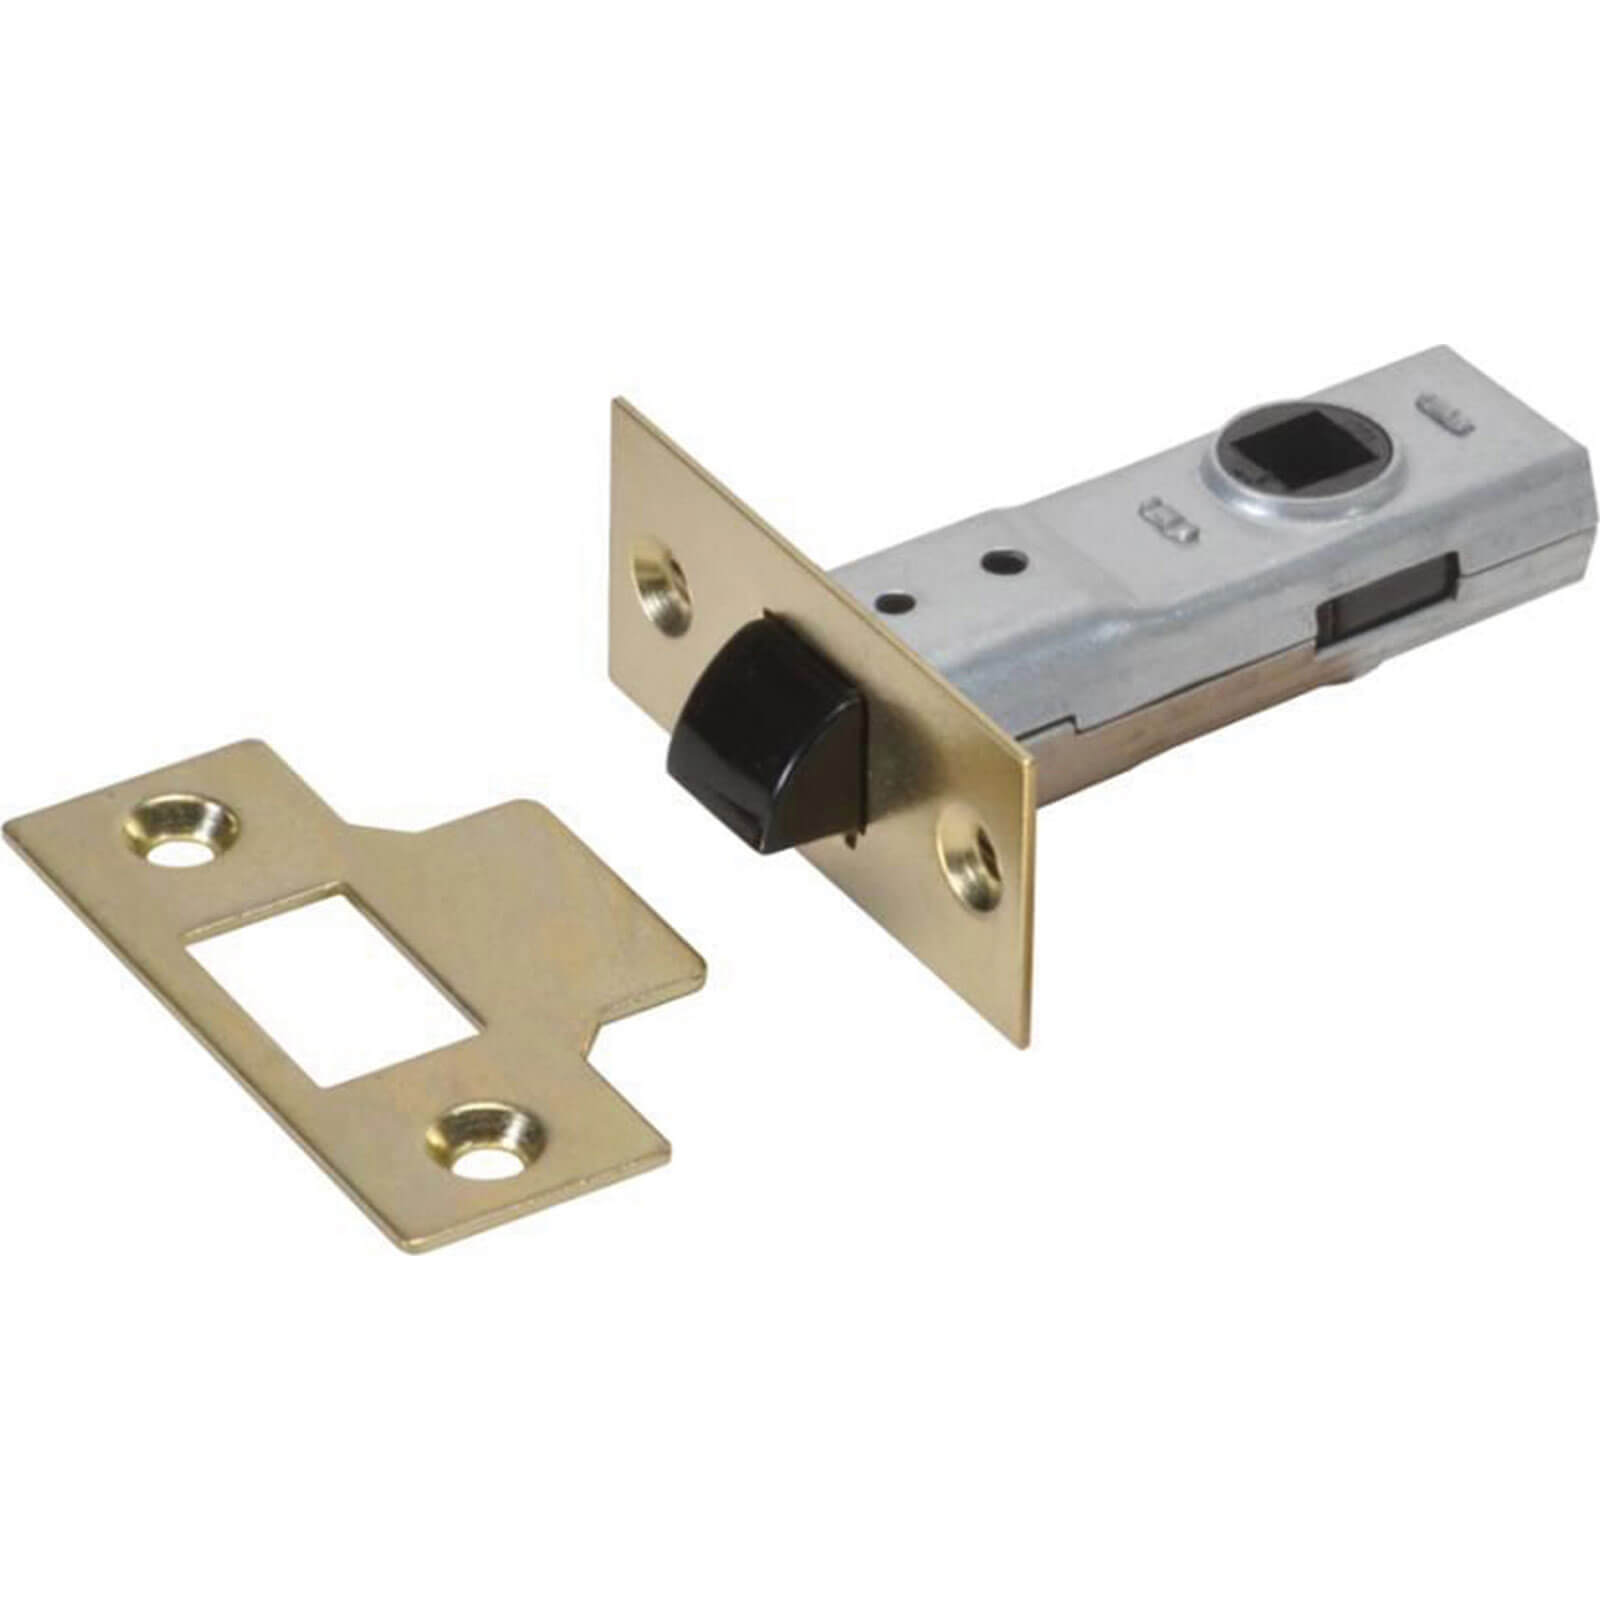 "Tooled Up/Ironmongery & Security/Ironmongery/Union J2600 Essentials Polished Brass Tubular Mortice Latch 65mm / 2.5"""